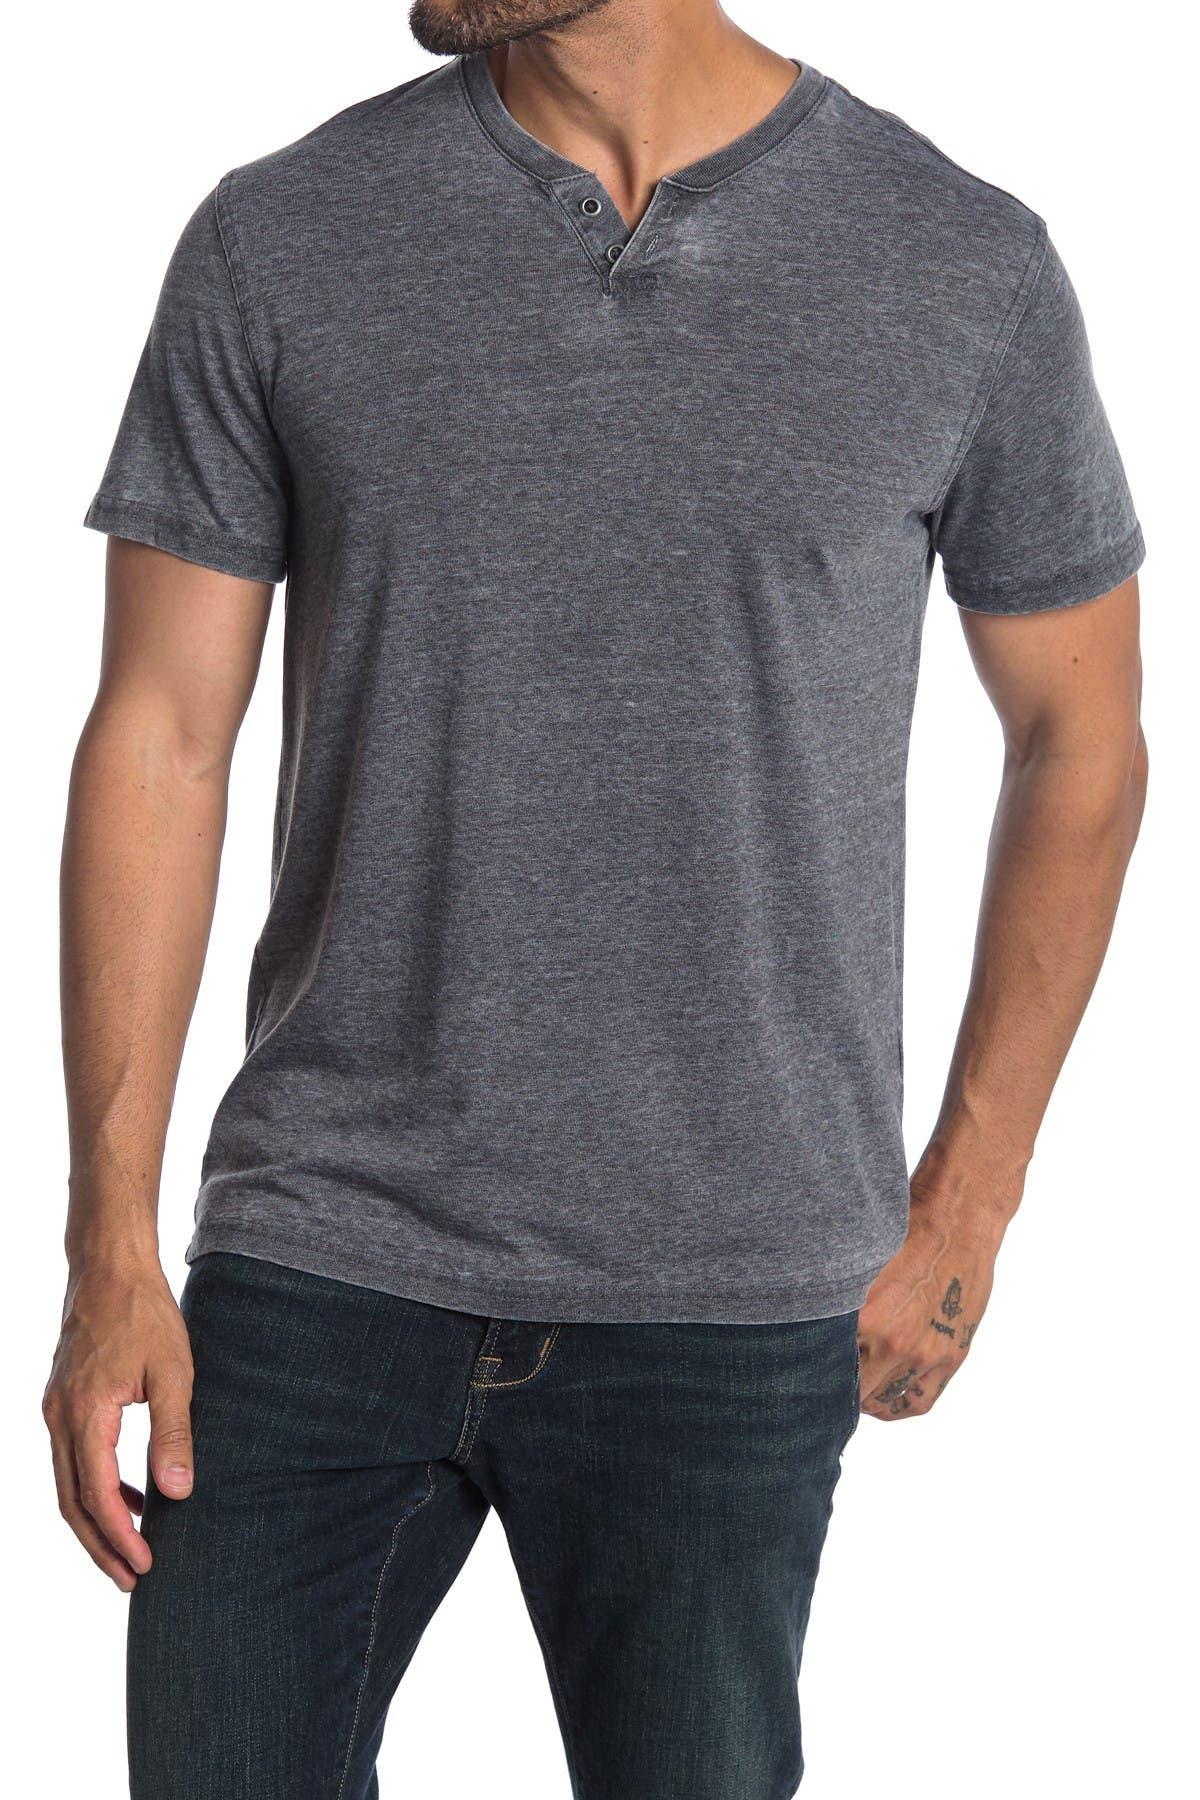 Image of Lucky Brand Short Sleeve Burnout 2 Button Henley T-Shirt